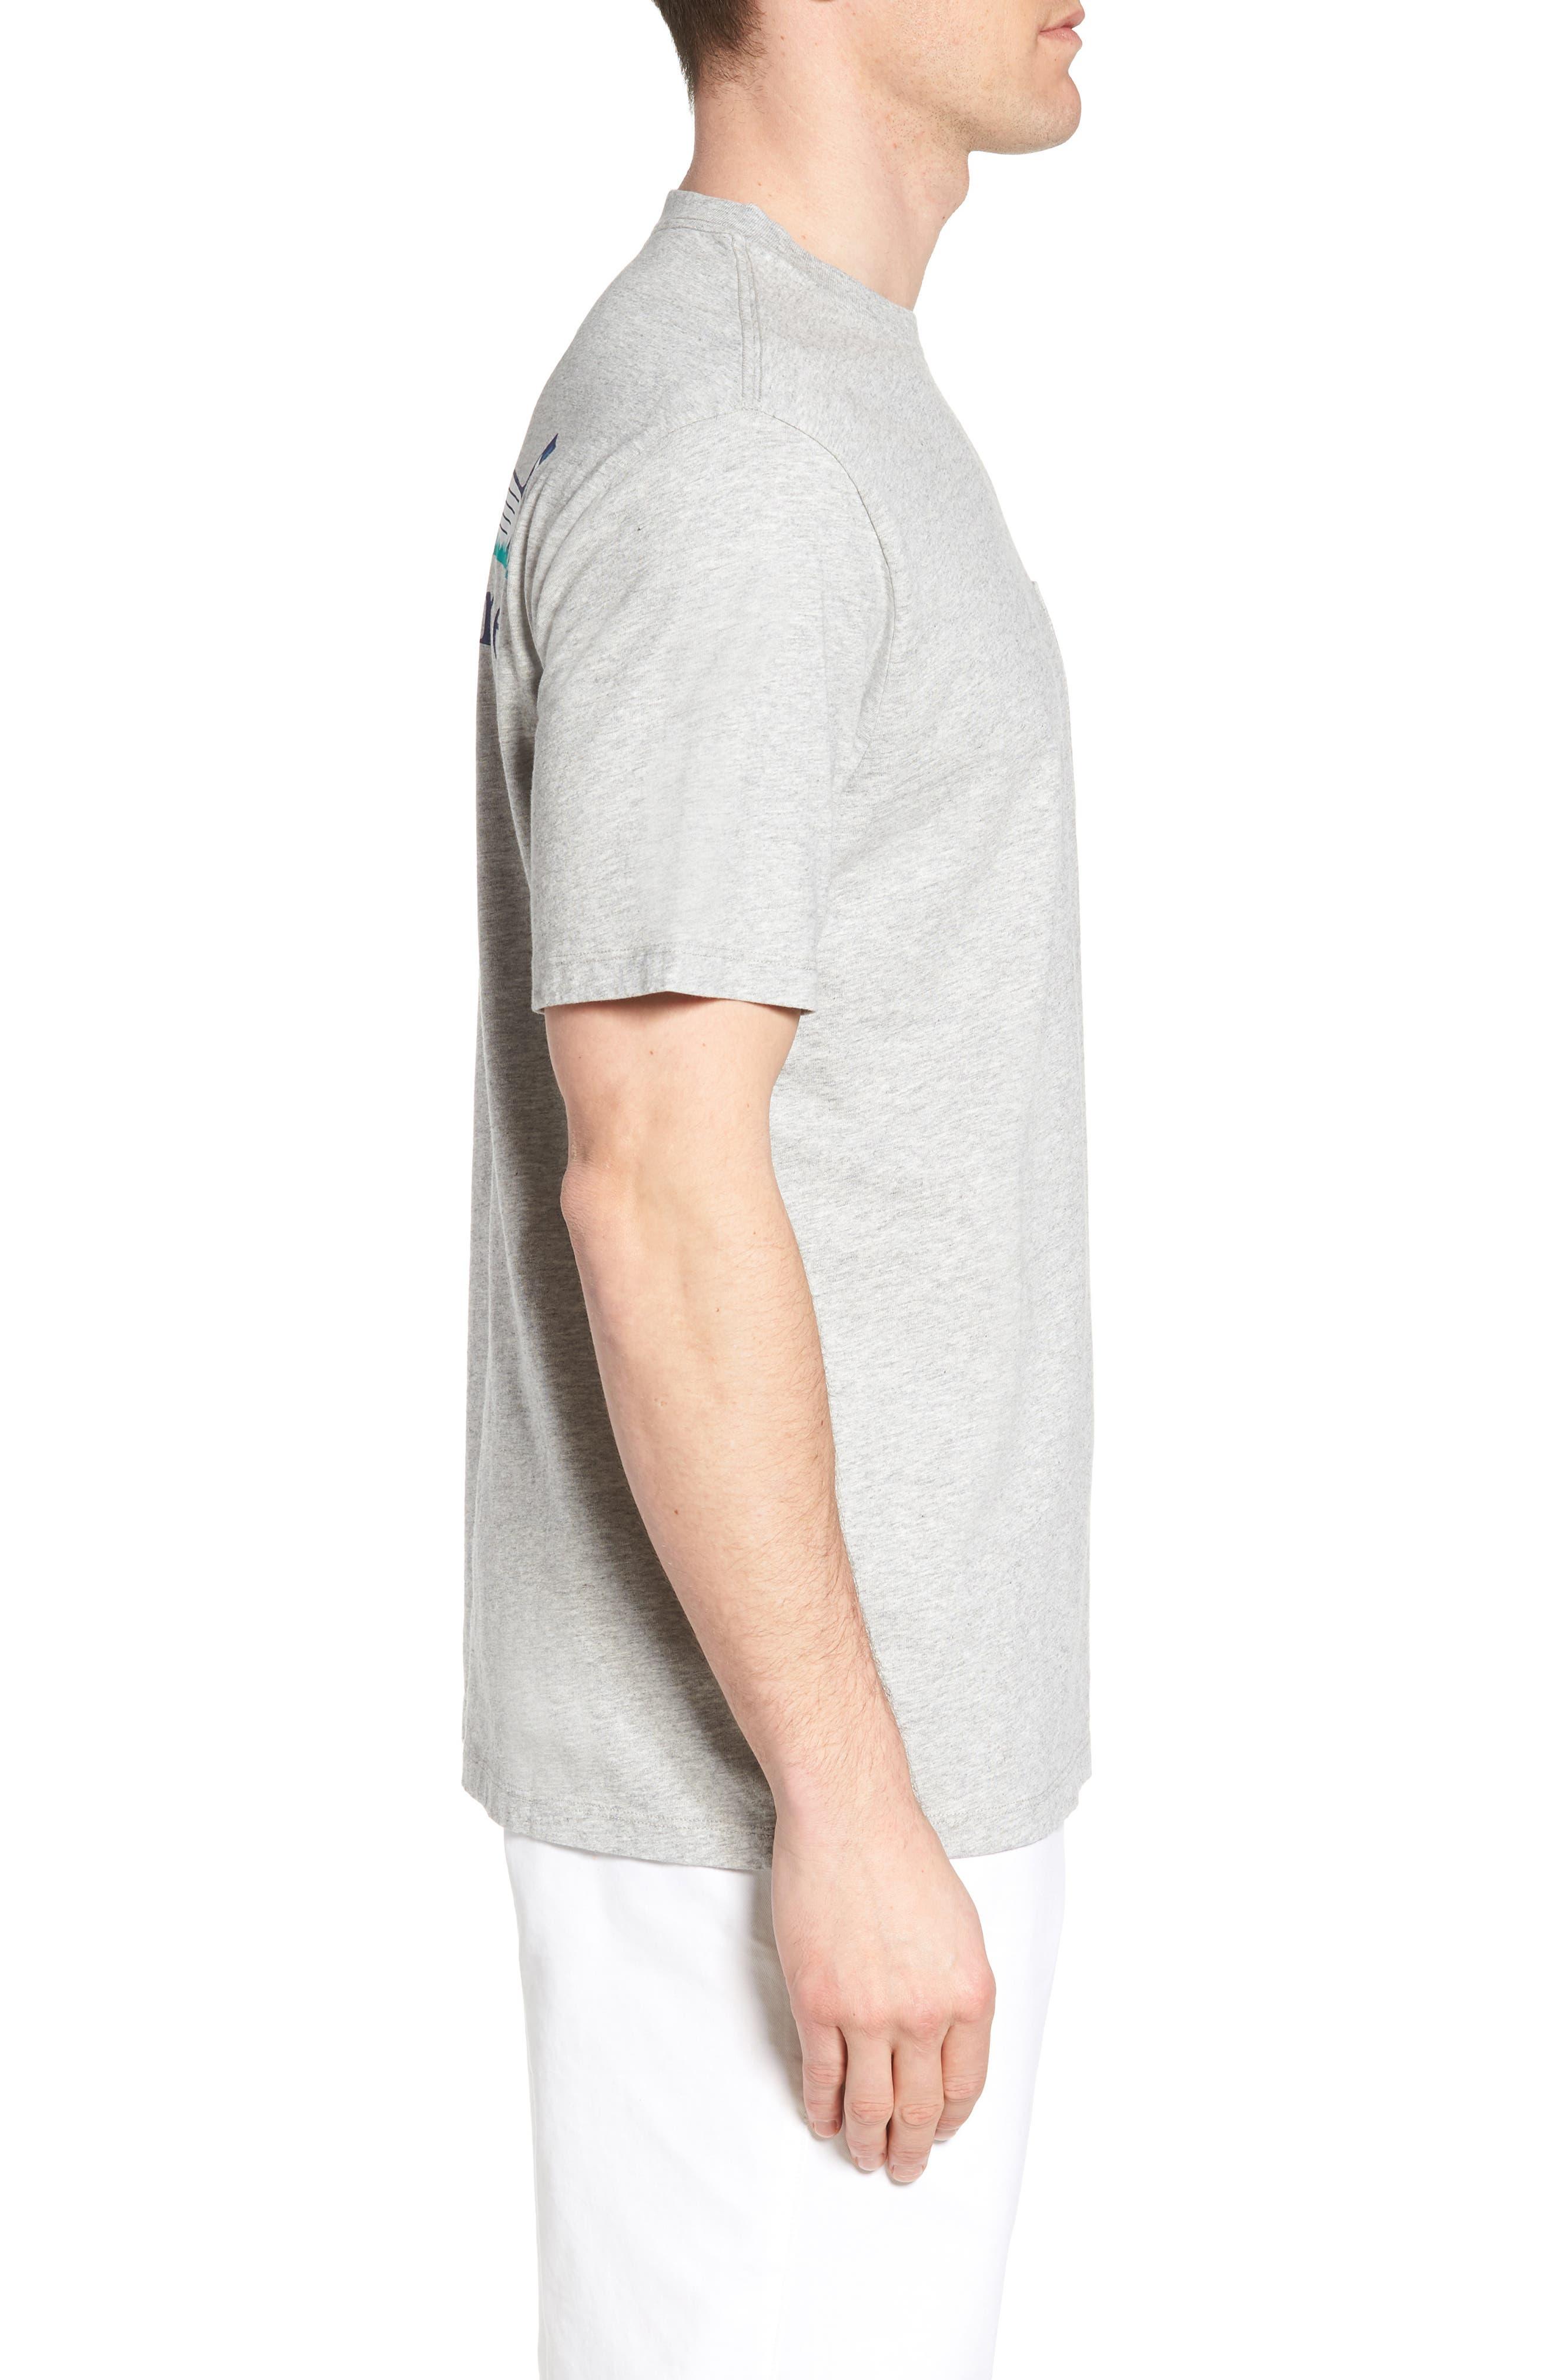 Regular Fit Golf T-Shirt,                             Alternate thumbnail 3, color,                             039